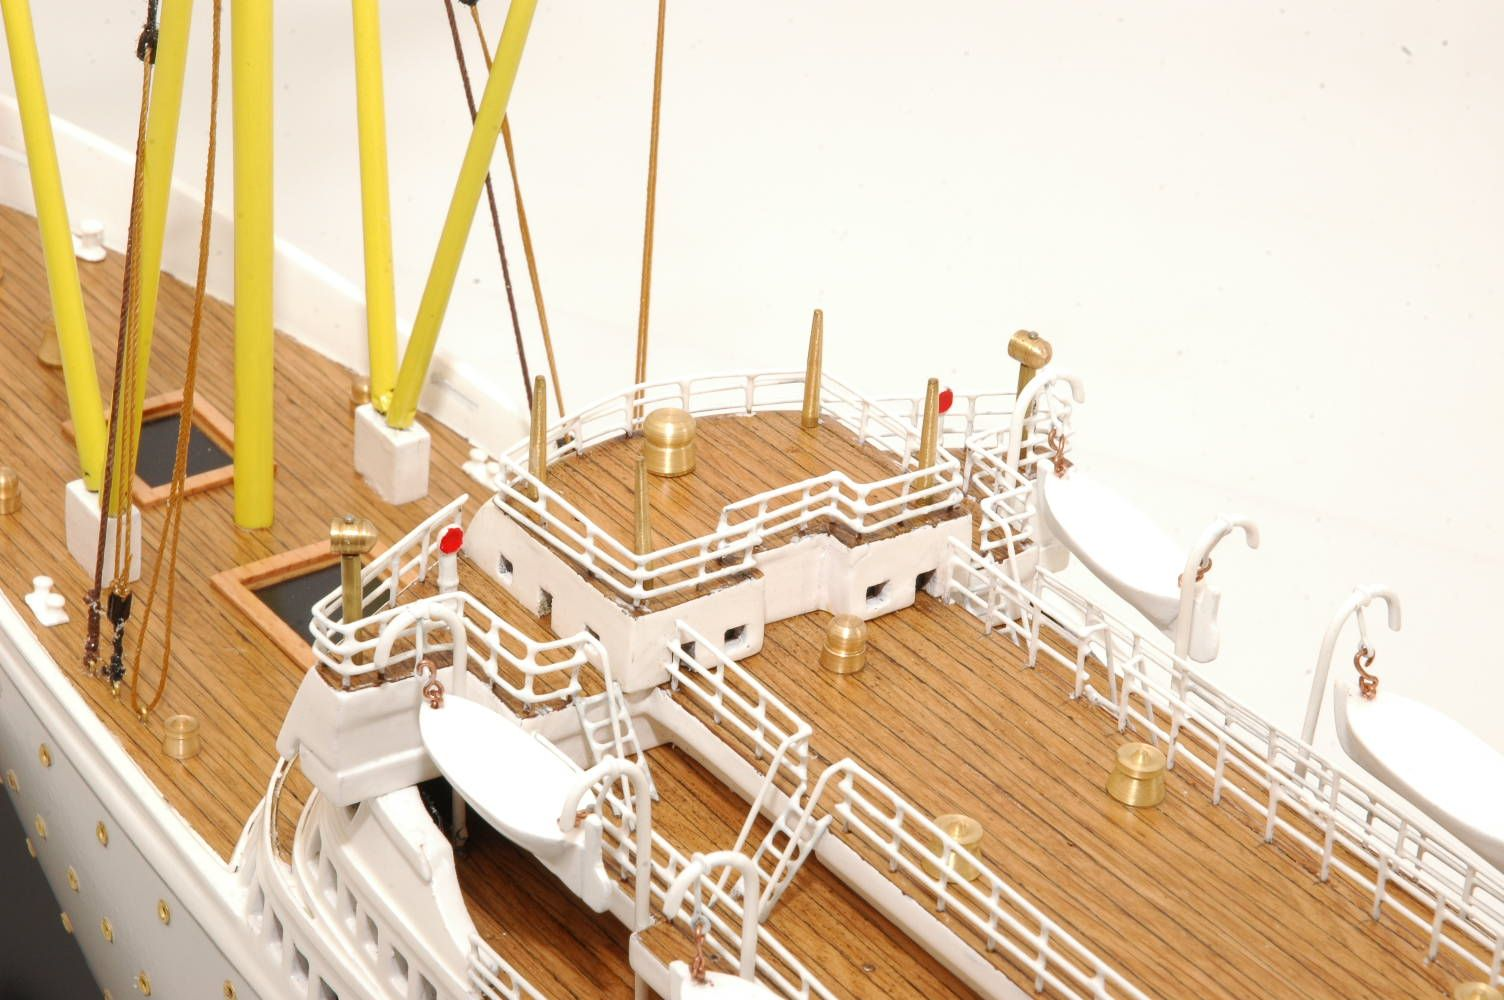 549-6440-Bergensfjord-model-ship